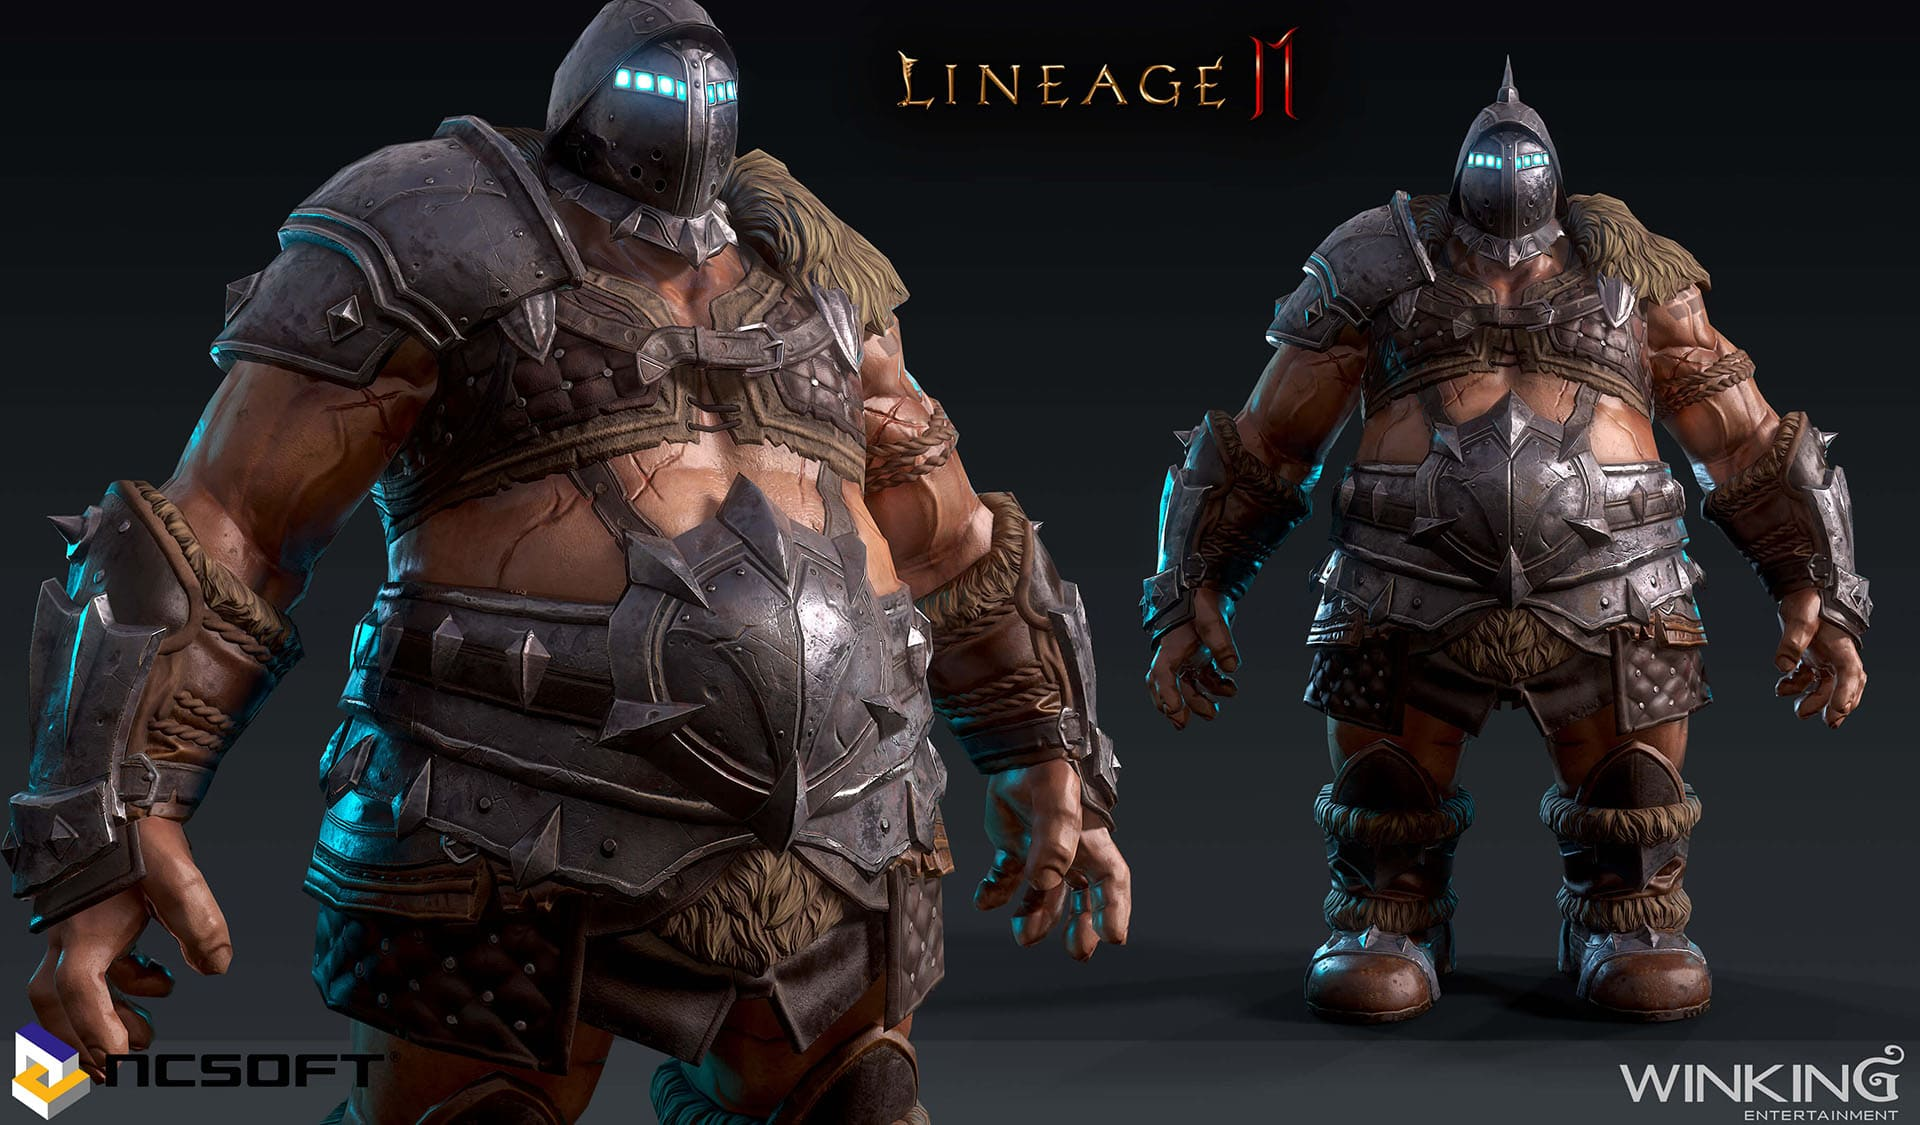 Lineage II M - 3D 모델링